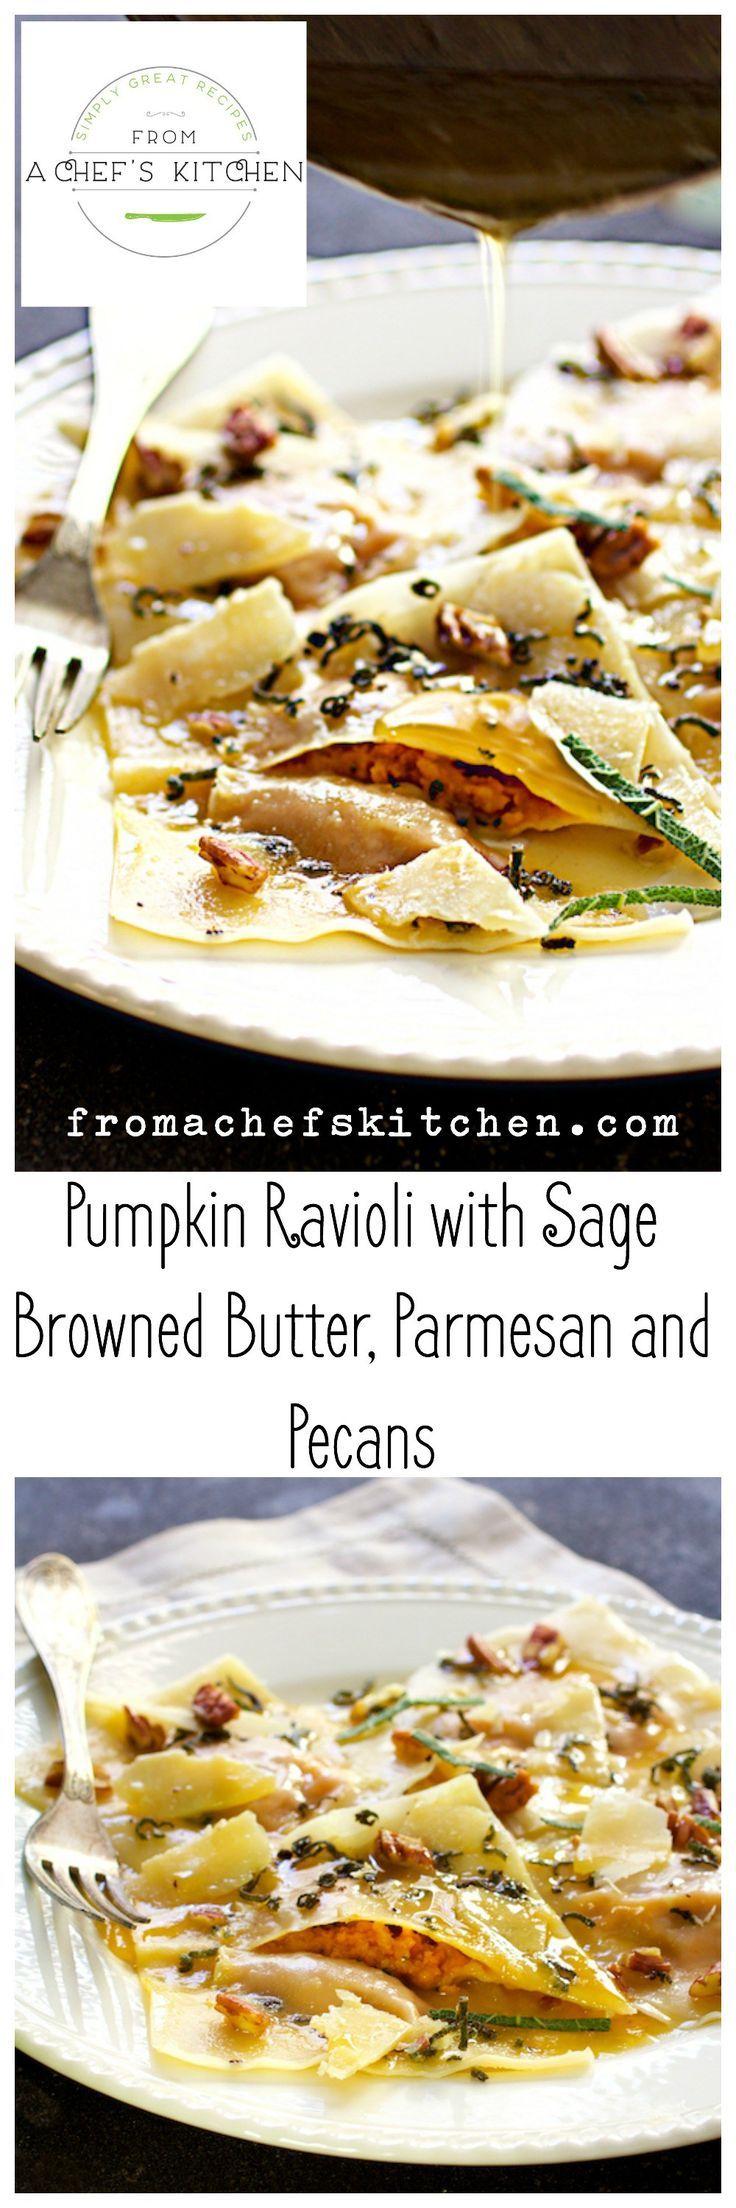 Pumpkin Ravioli with Sage Browned Butter, Parmesan and Pecans